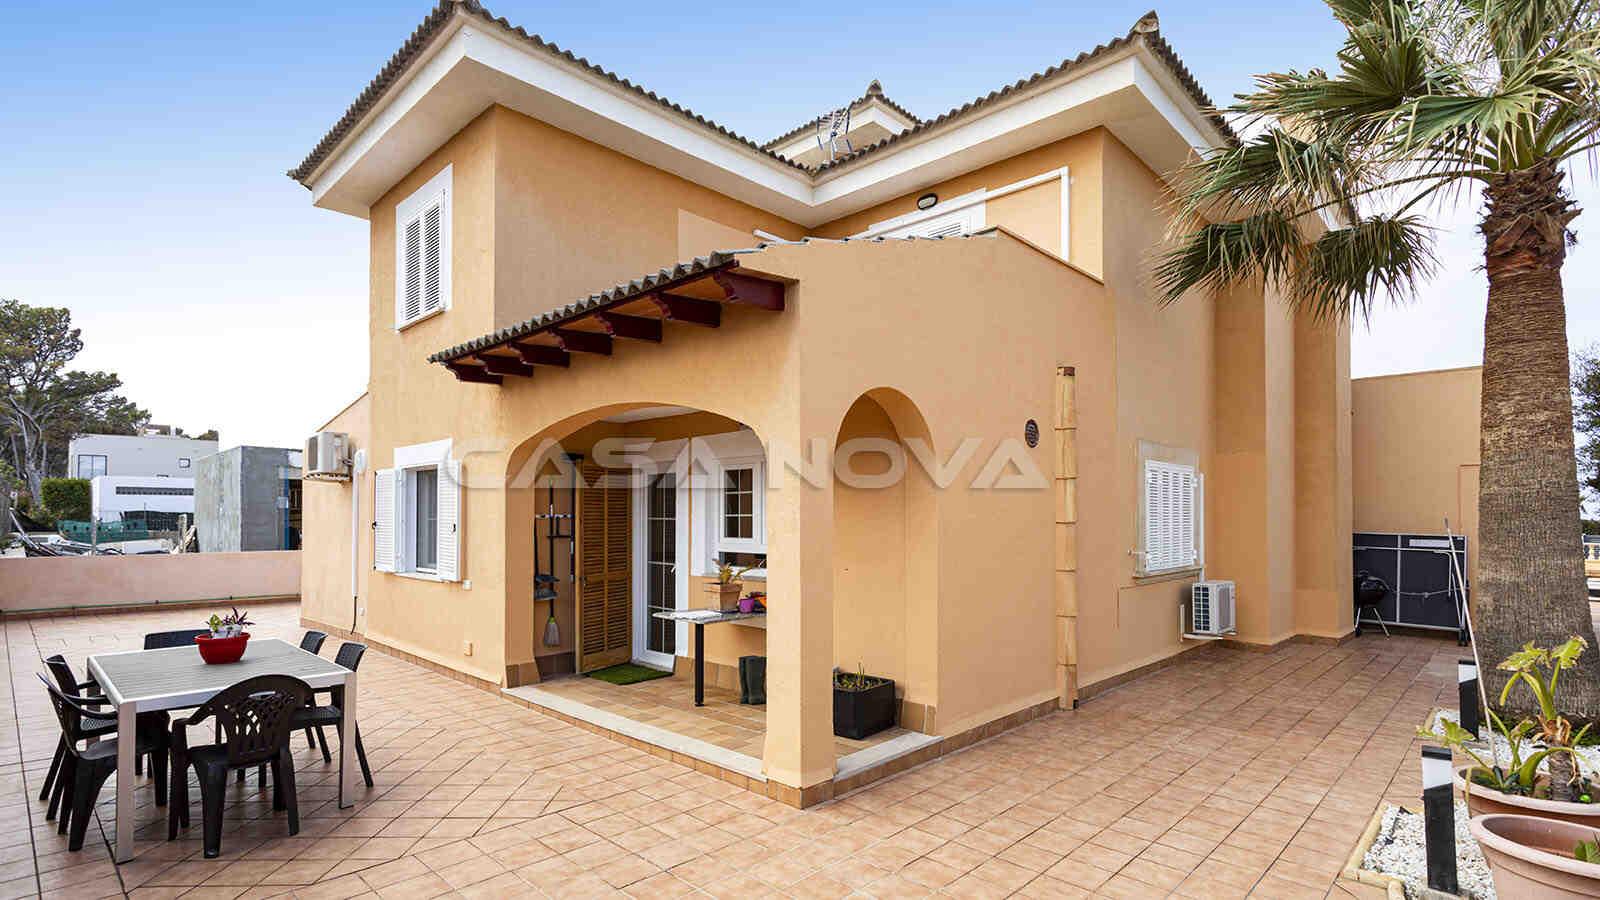 Mallorca Villa mit großzügigen Terrassenflächen